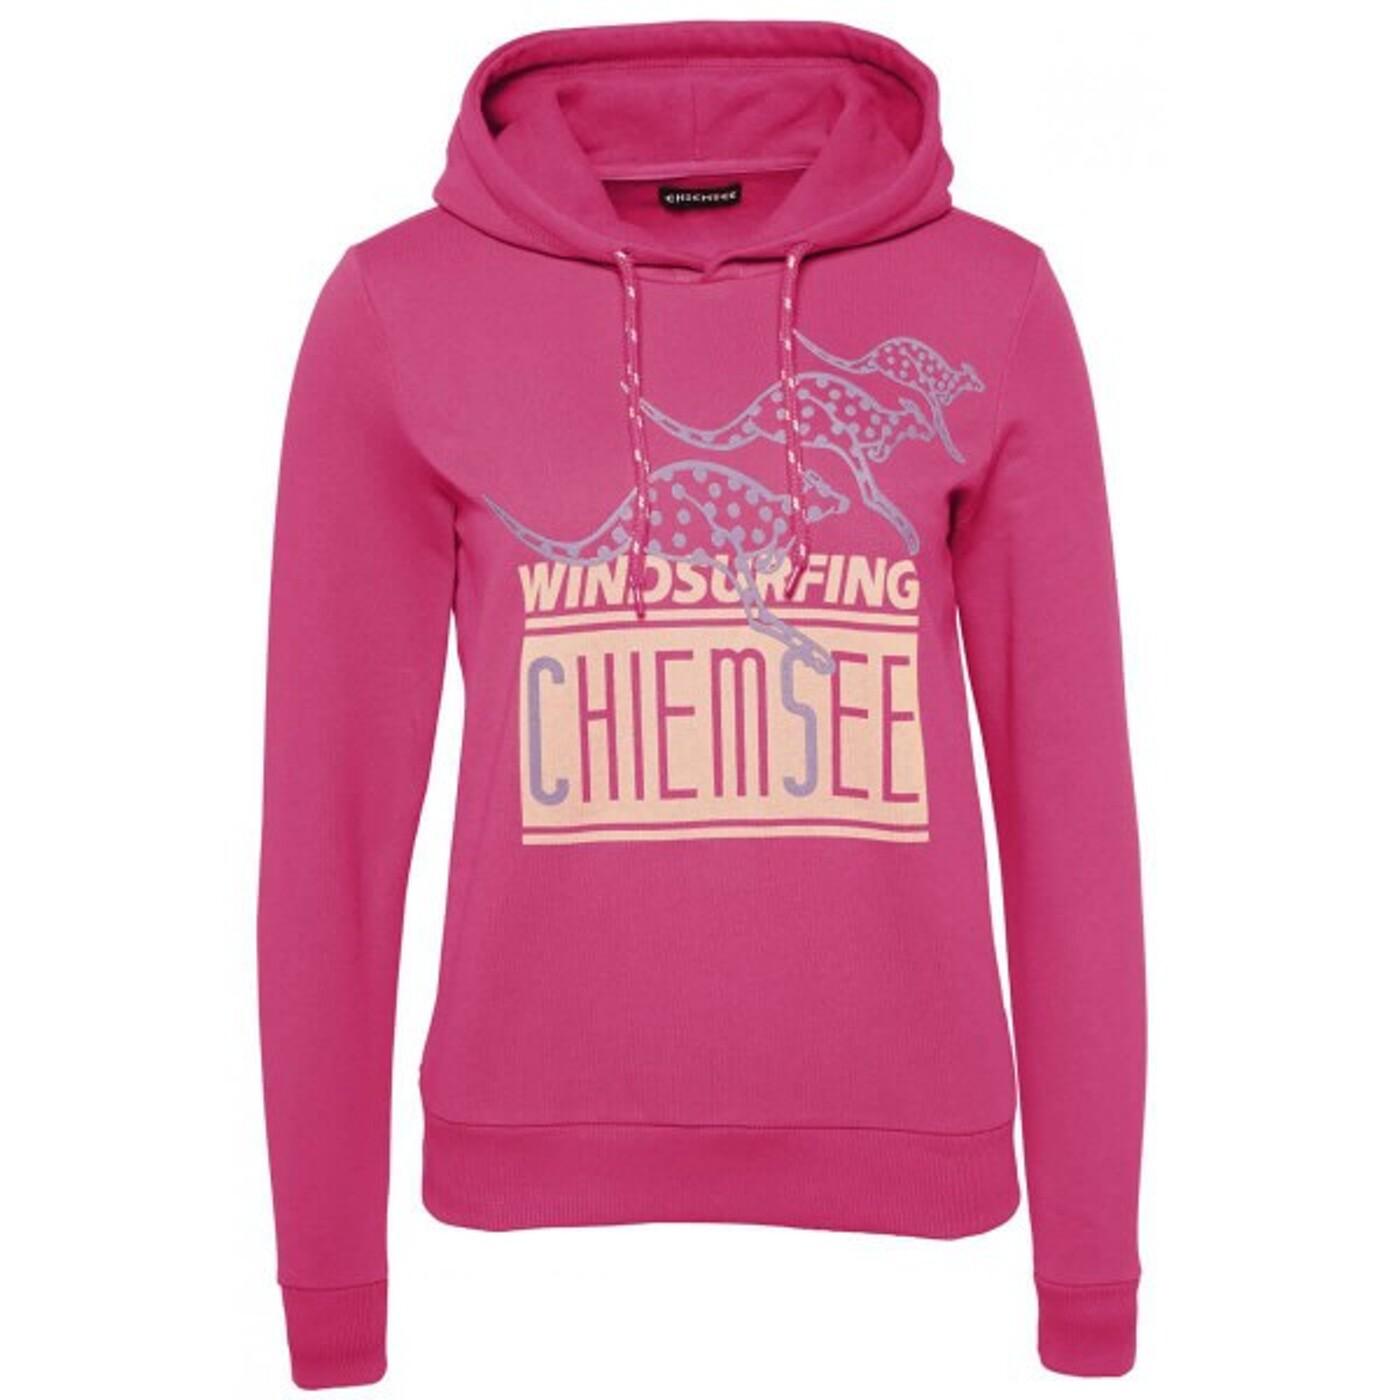 PULLOVER  ANGEL FIRE Sweatshirt CHIEMSEE - Damen